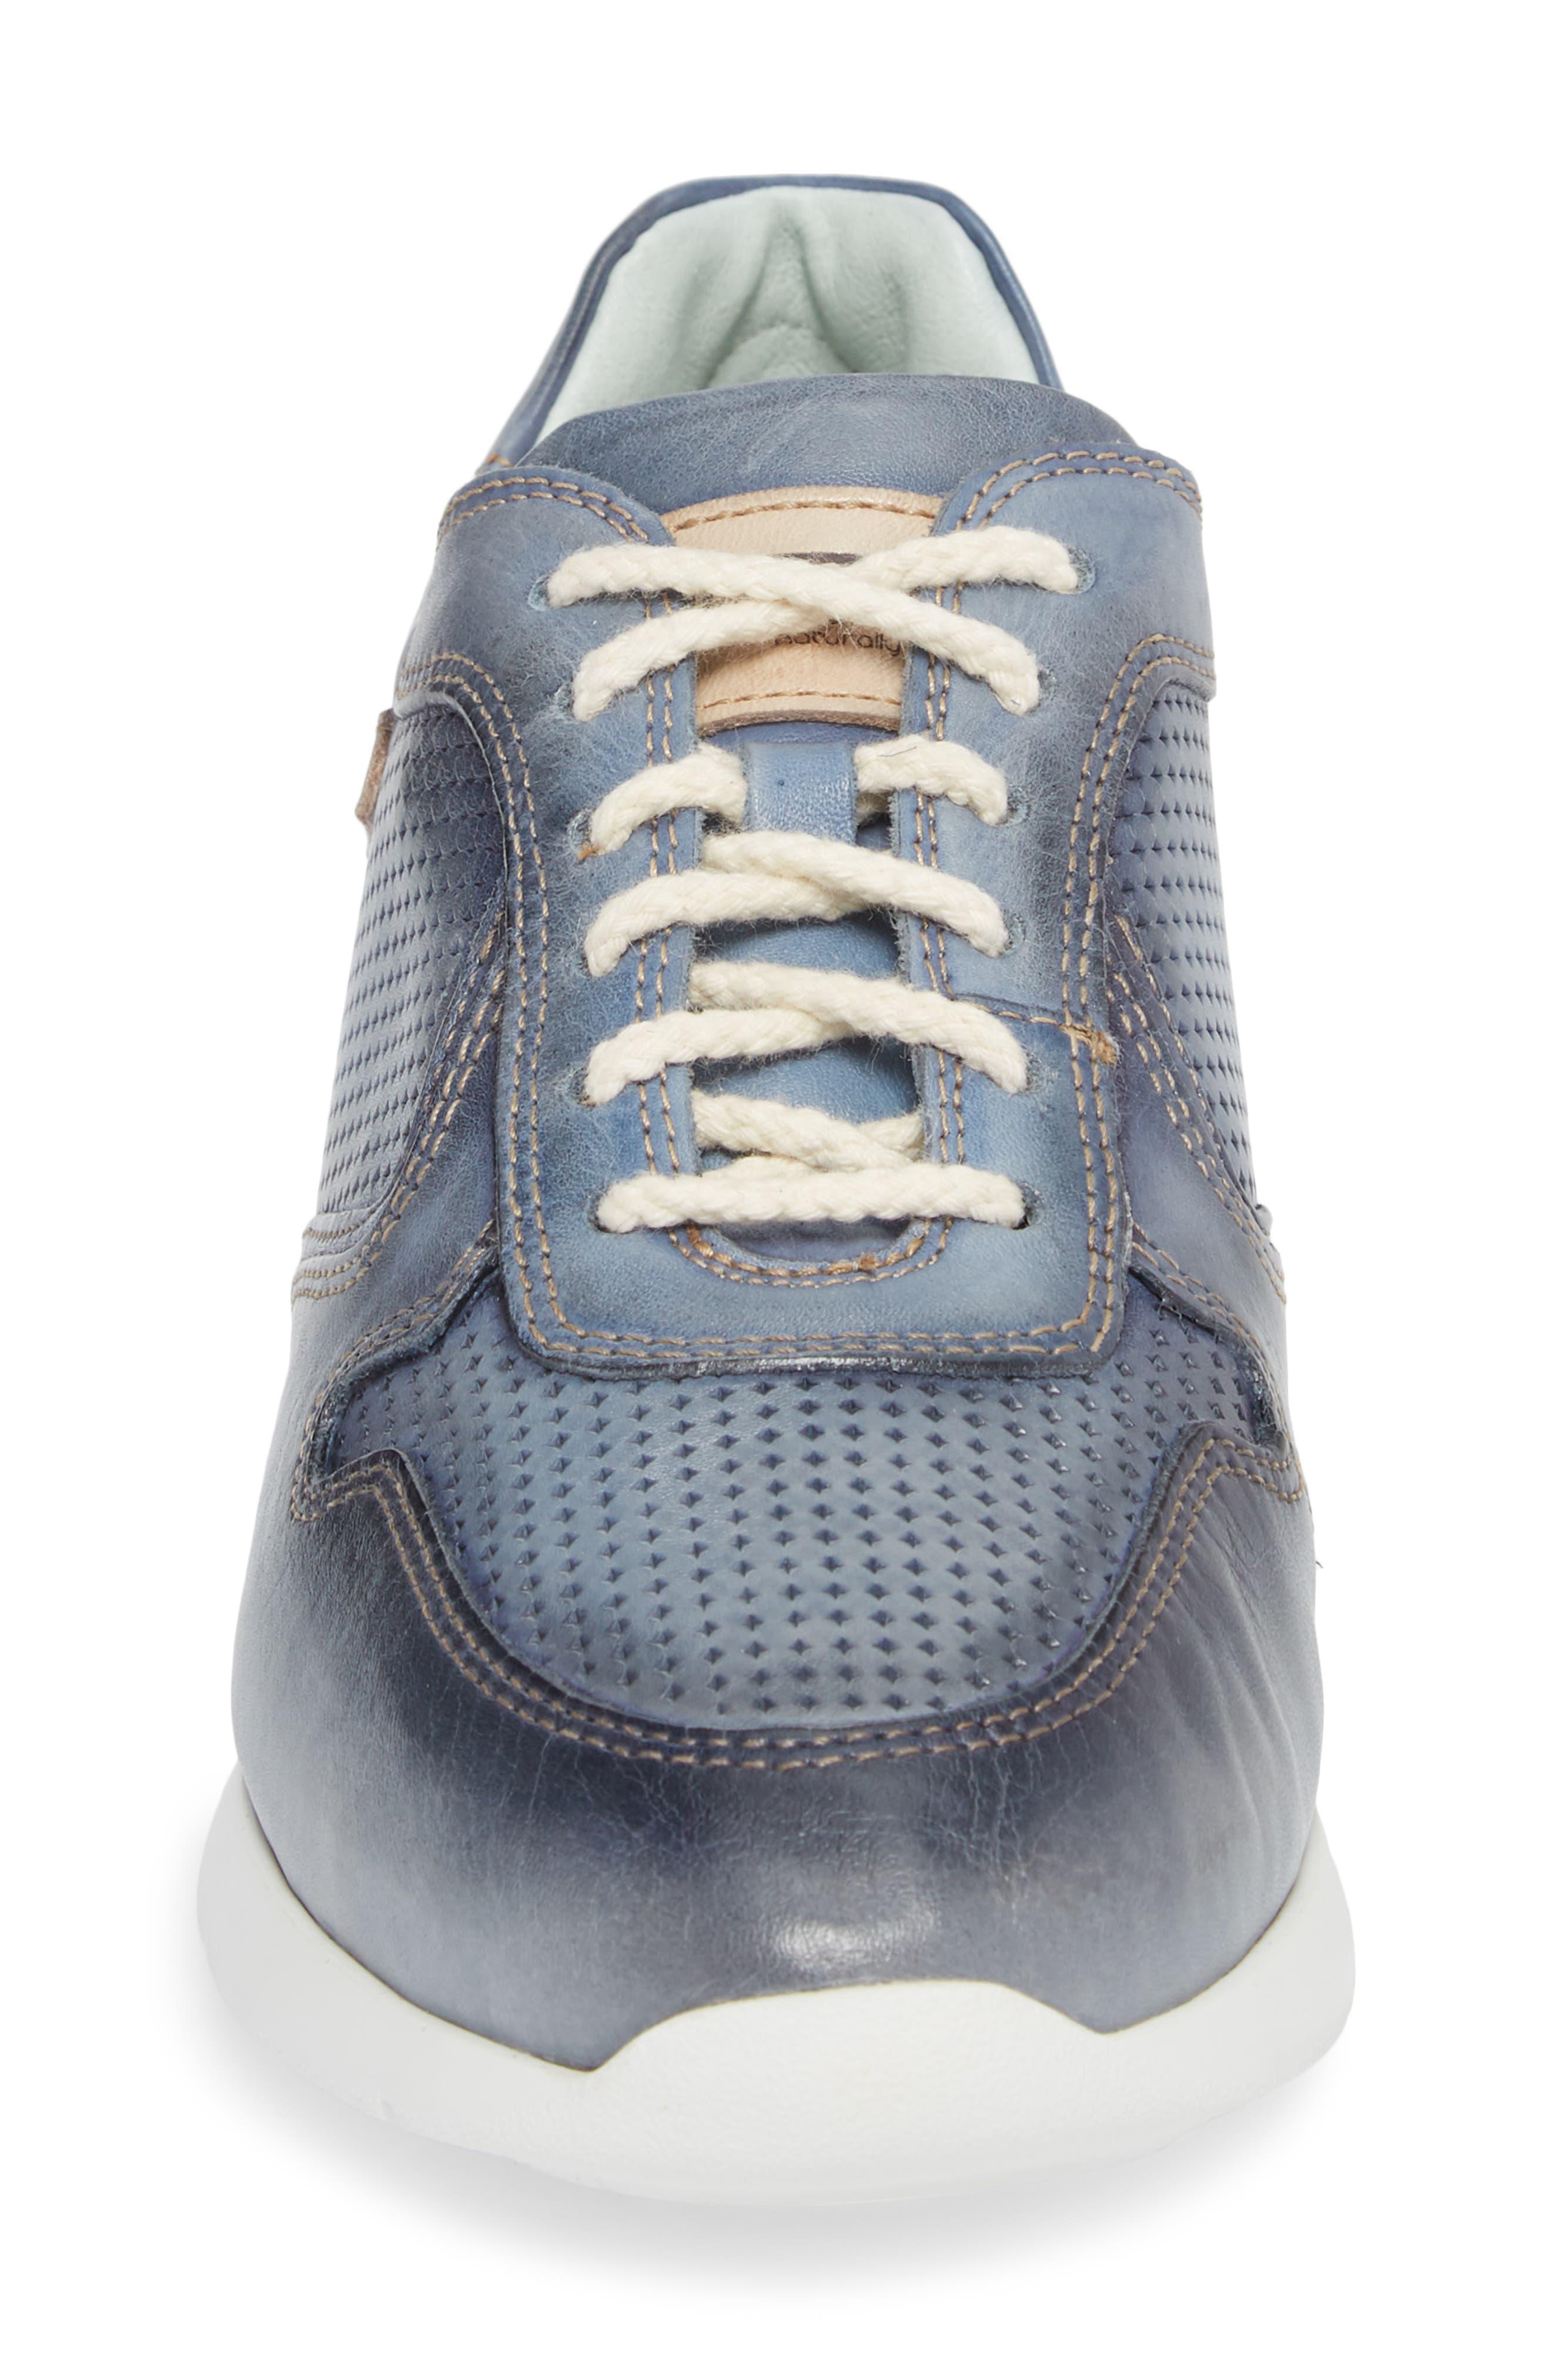 Modena Sneaker,                             Alternate thumbnail 4, color,                             400